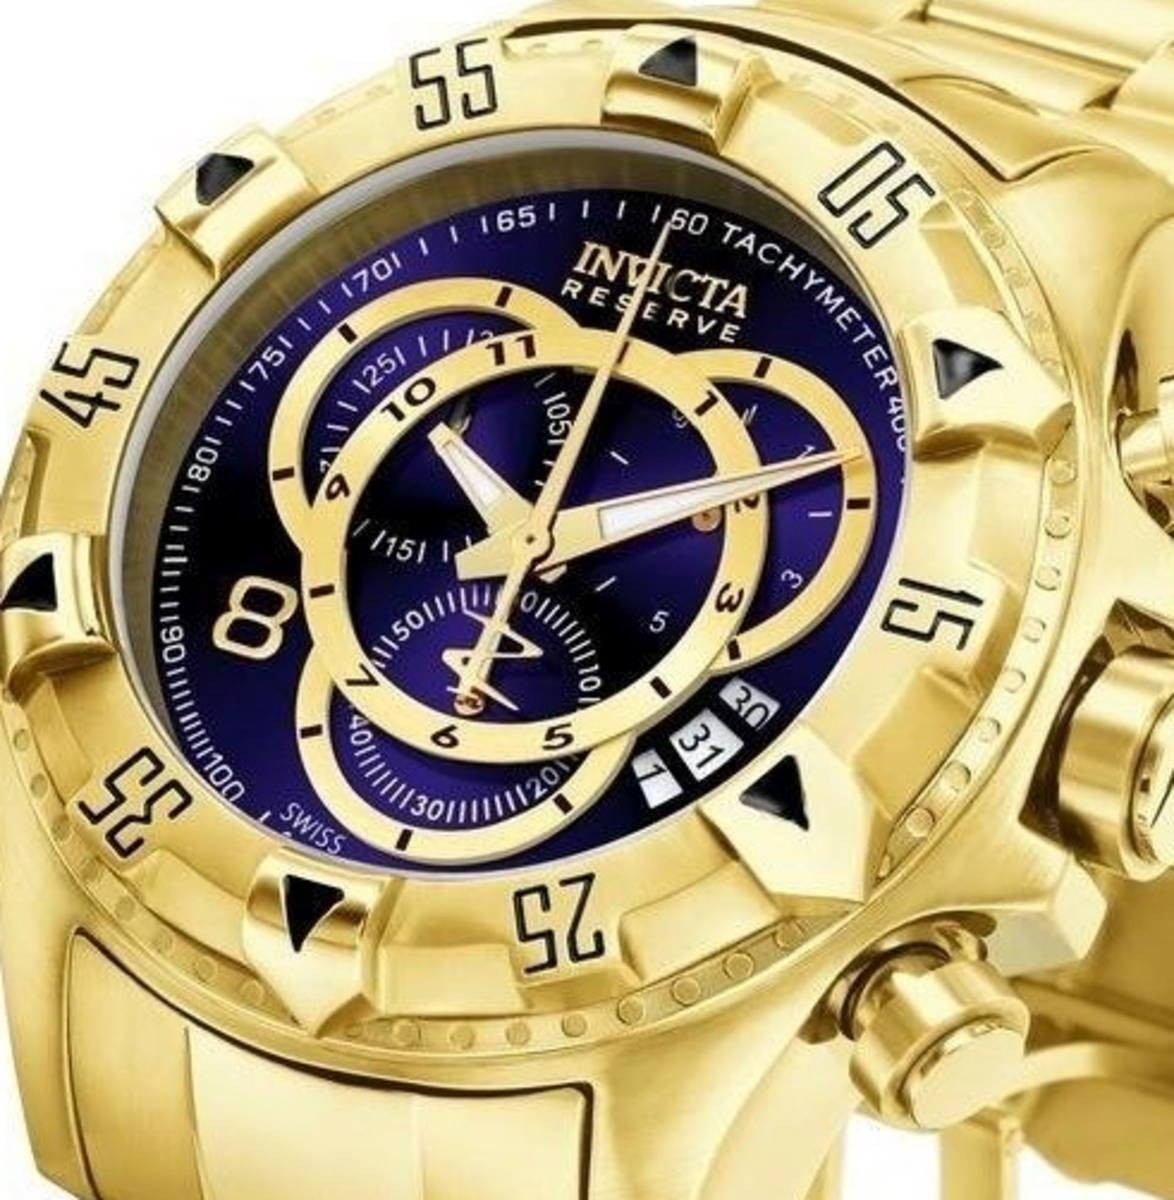 aaae46bb7ed relógio invicta excursion 6469 original dourado azul 18k. Carregando zoom.